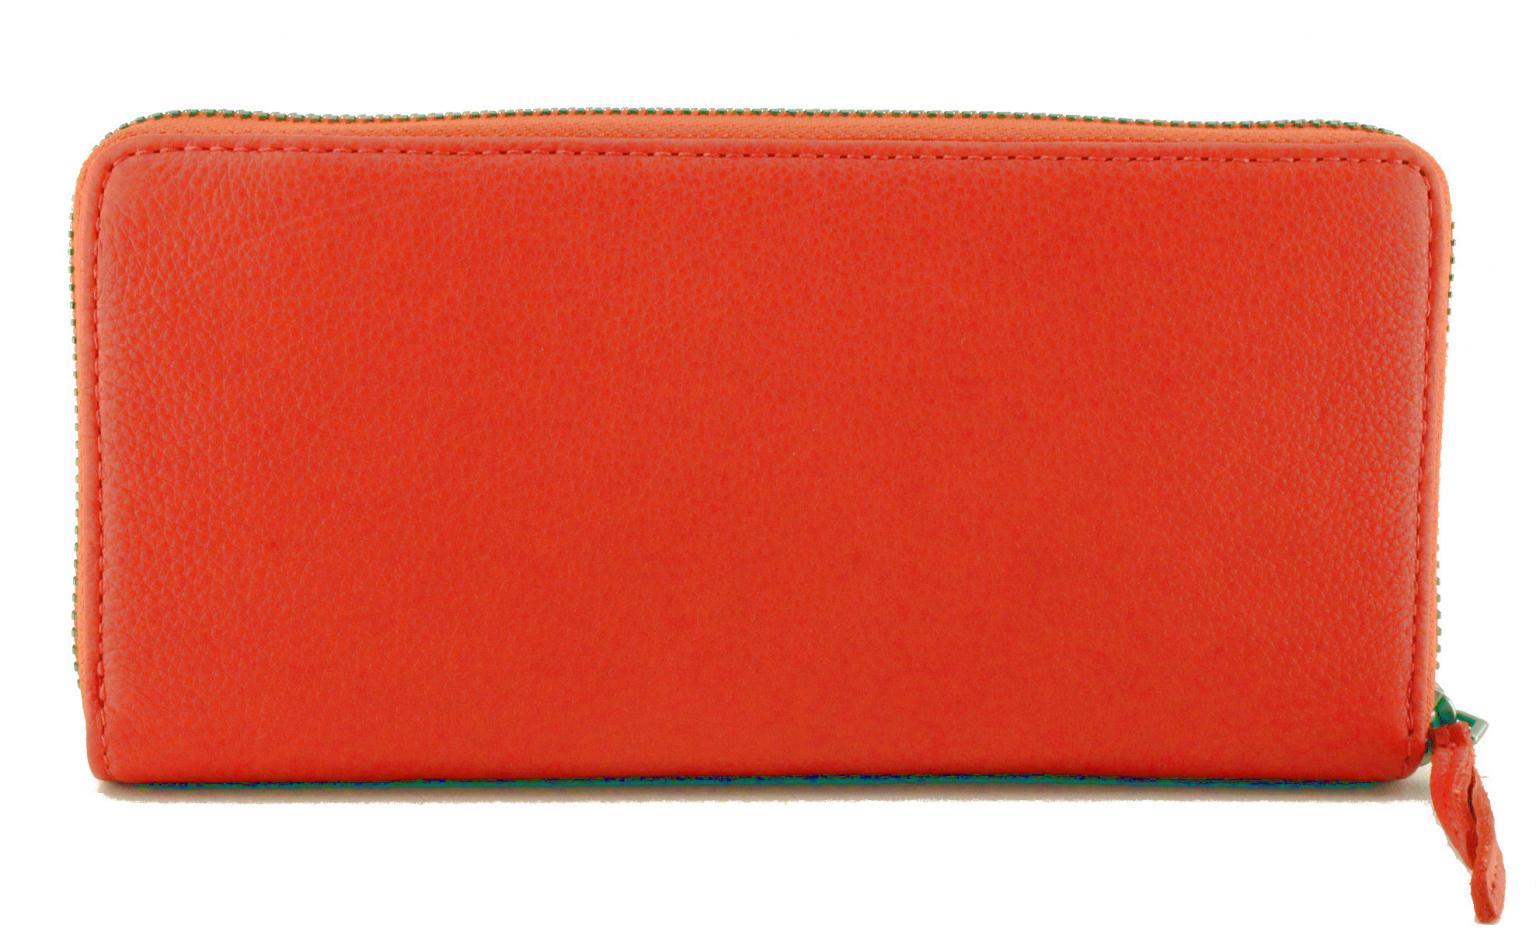 Liebeskind SallyH7 Lederbörse Vintage Solid Striped Red